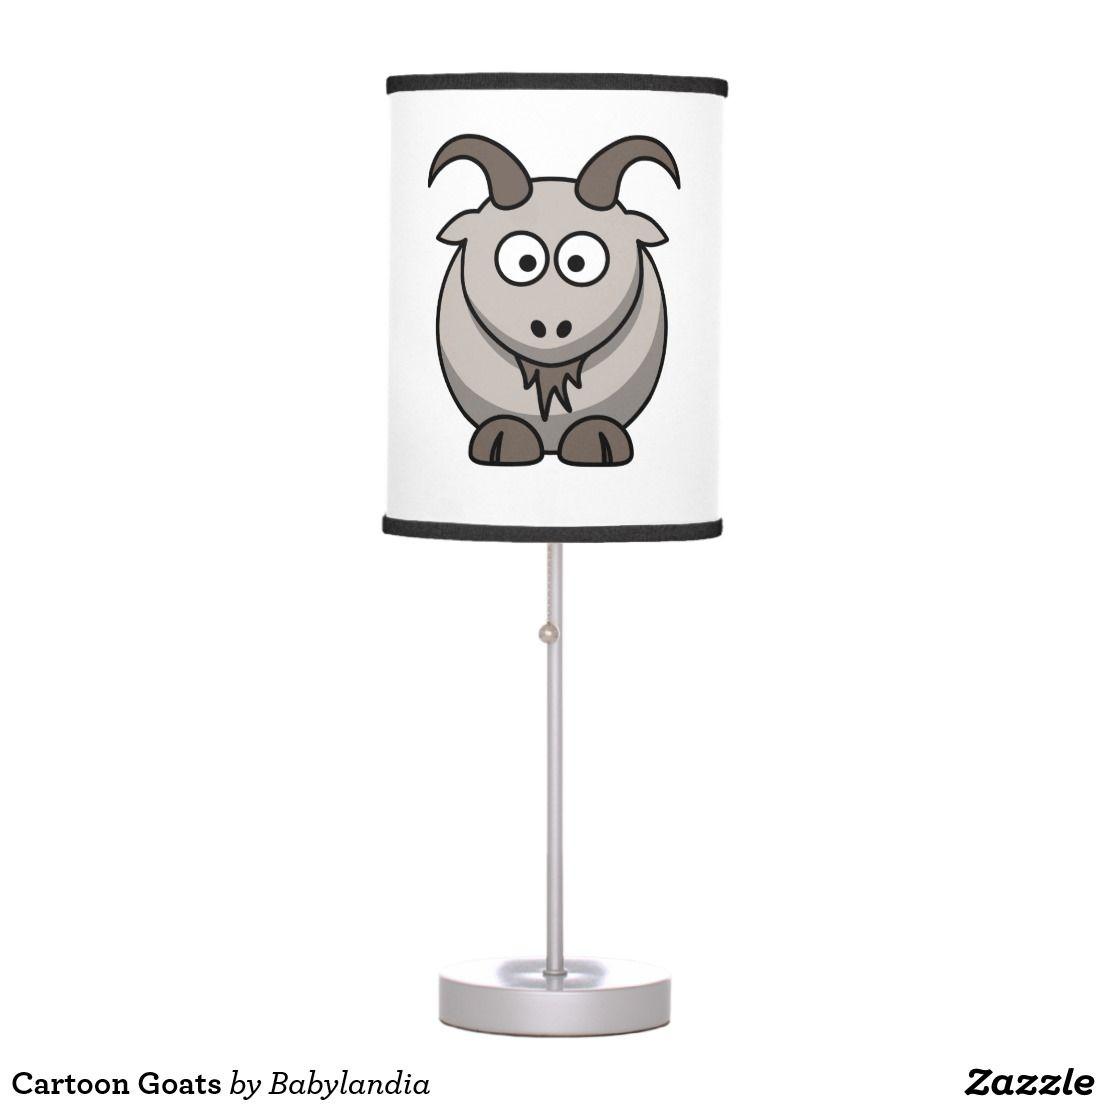 Cartoon Goats Table Lamp Zazzle Com Lamp Cartoon Goats